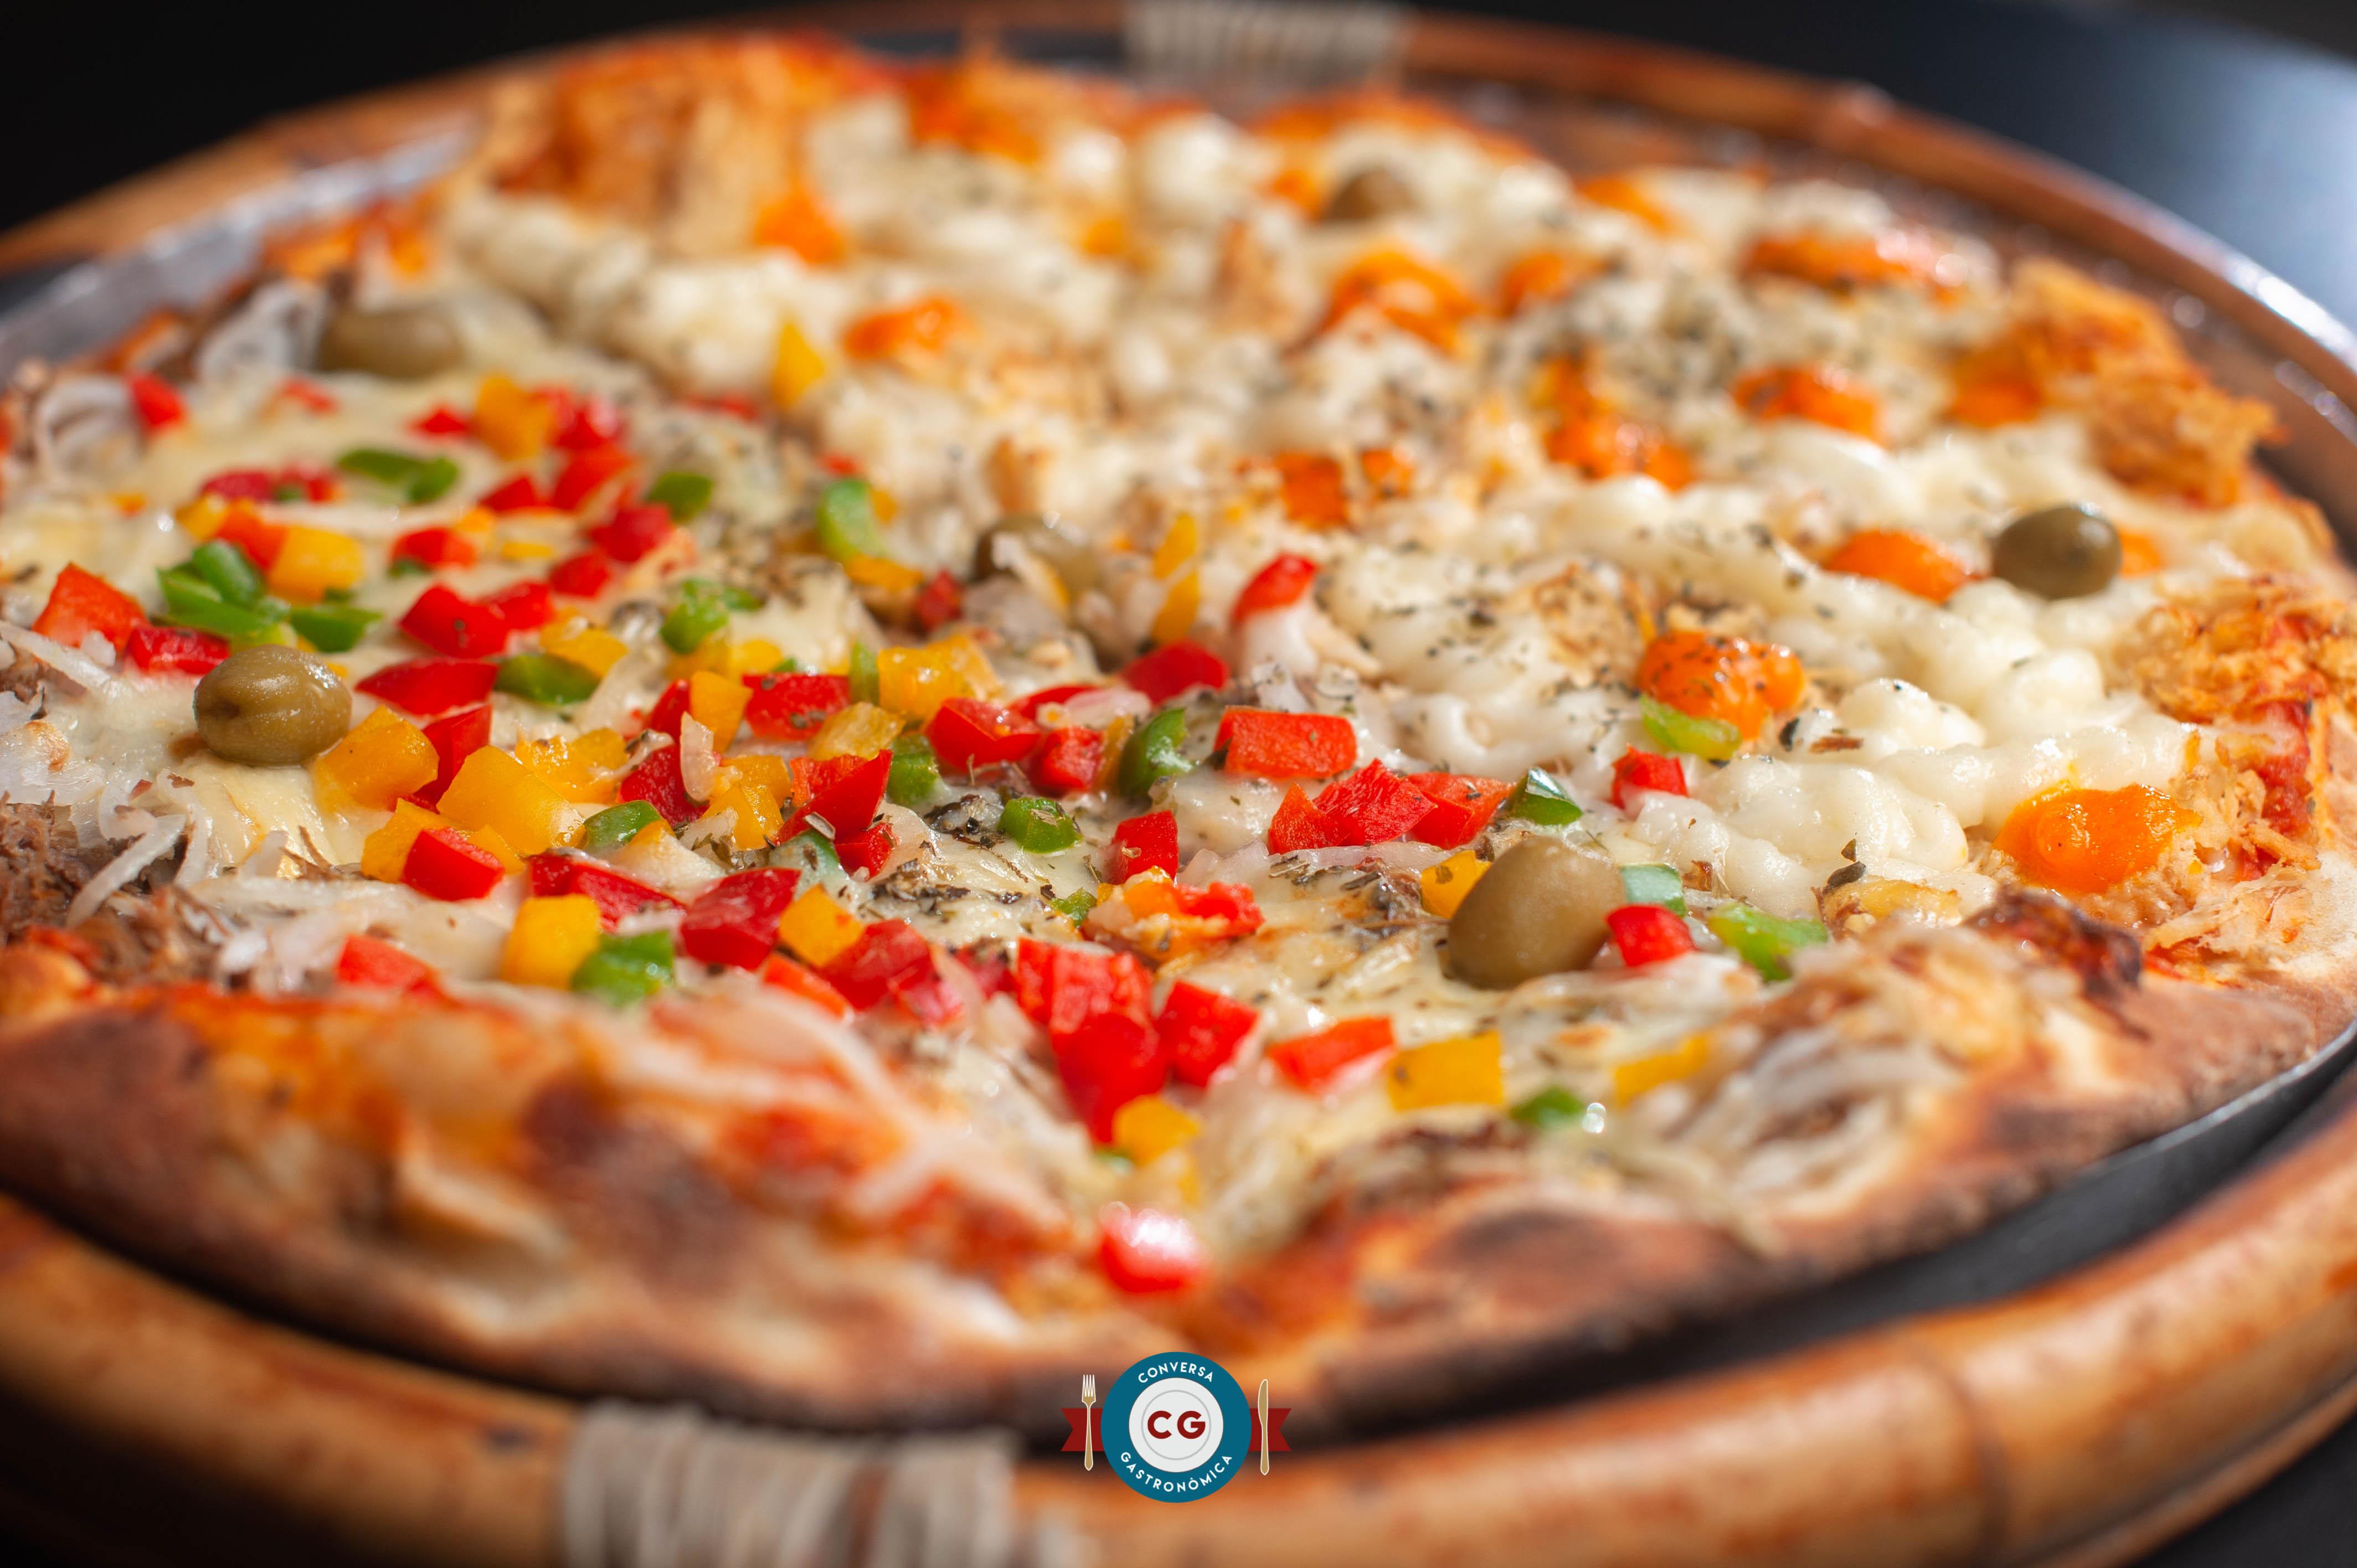 Pirata's tem rock e pizza italiana artesanal